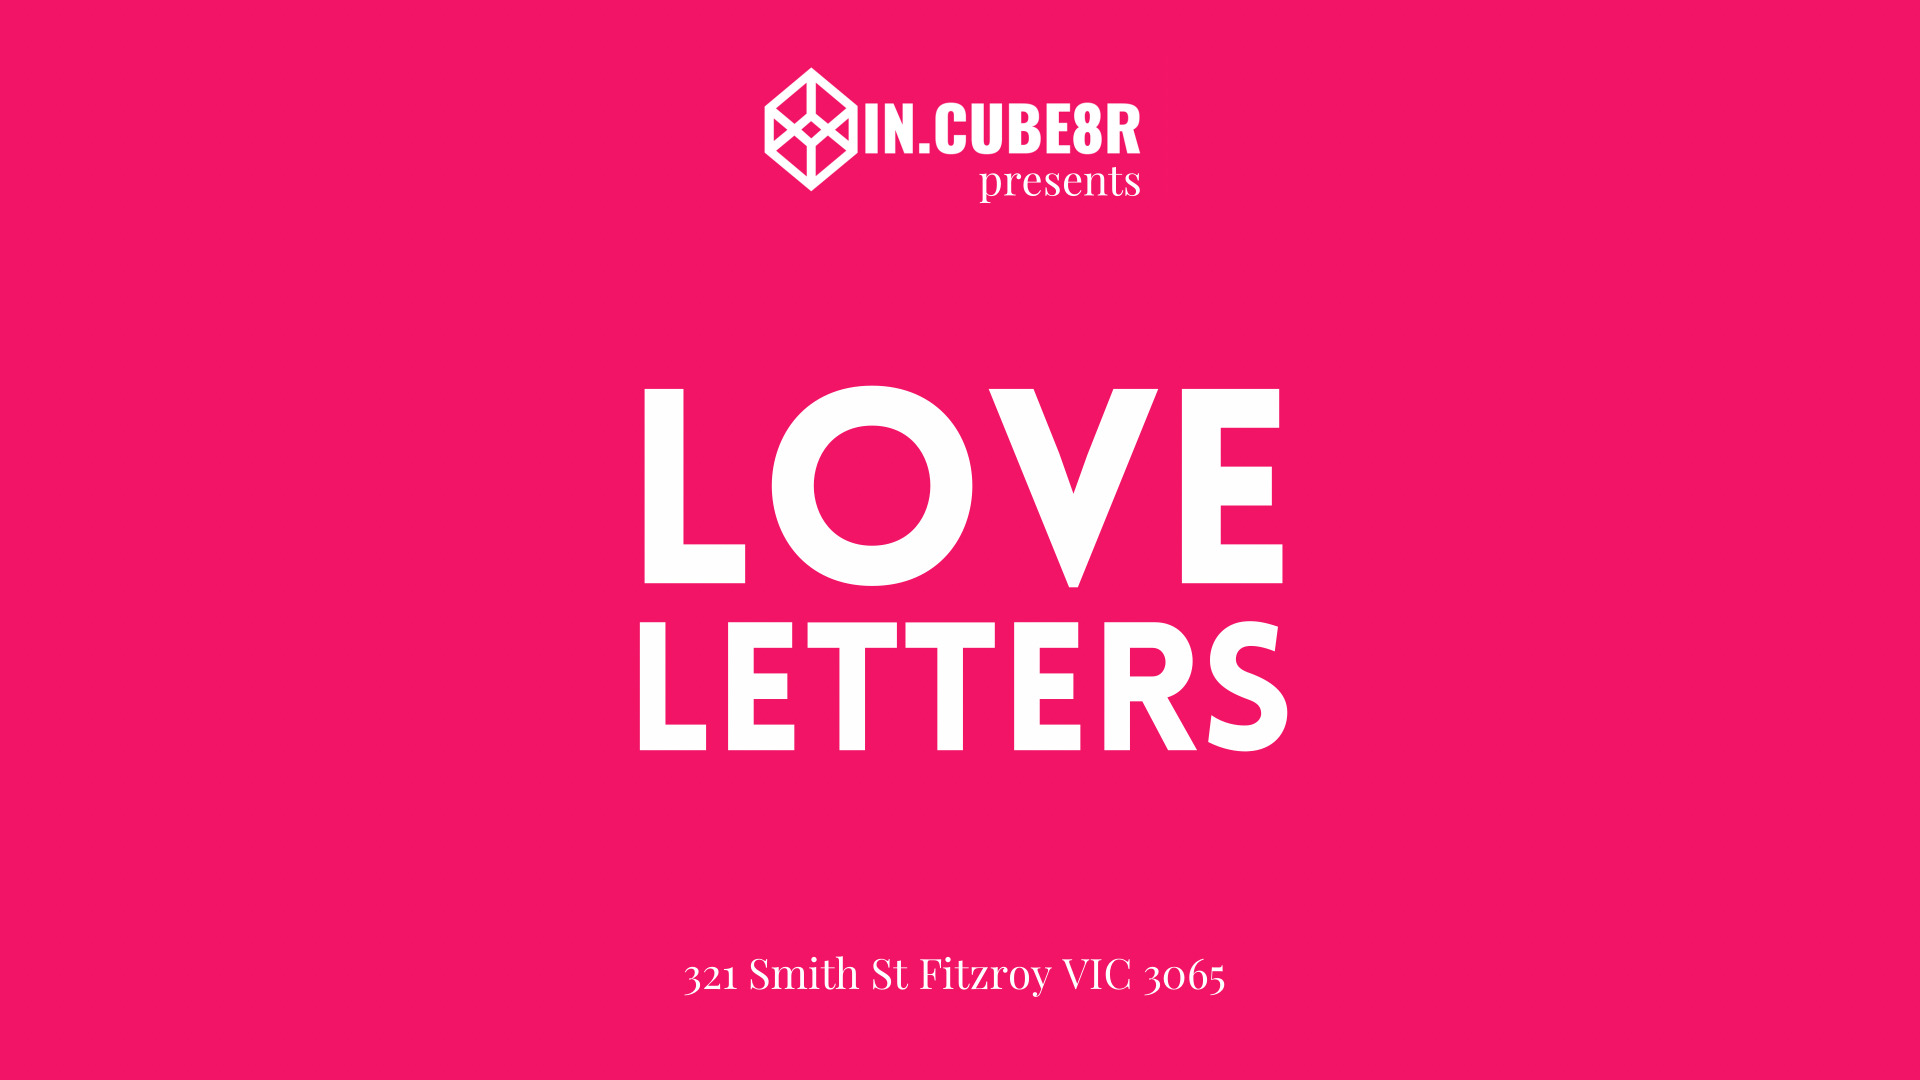 love-letters-group-exhibition ellemay.michael 586352